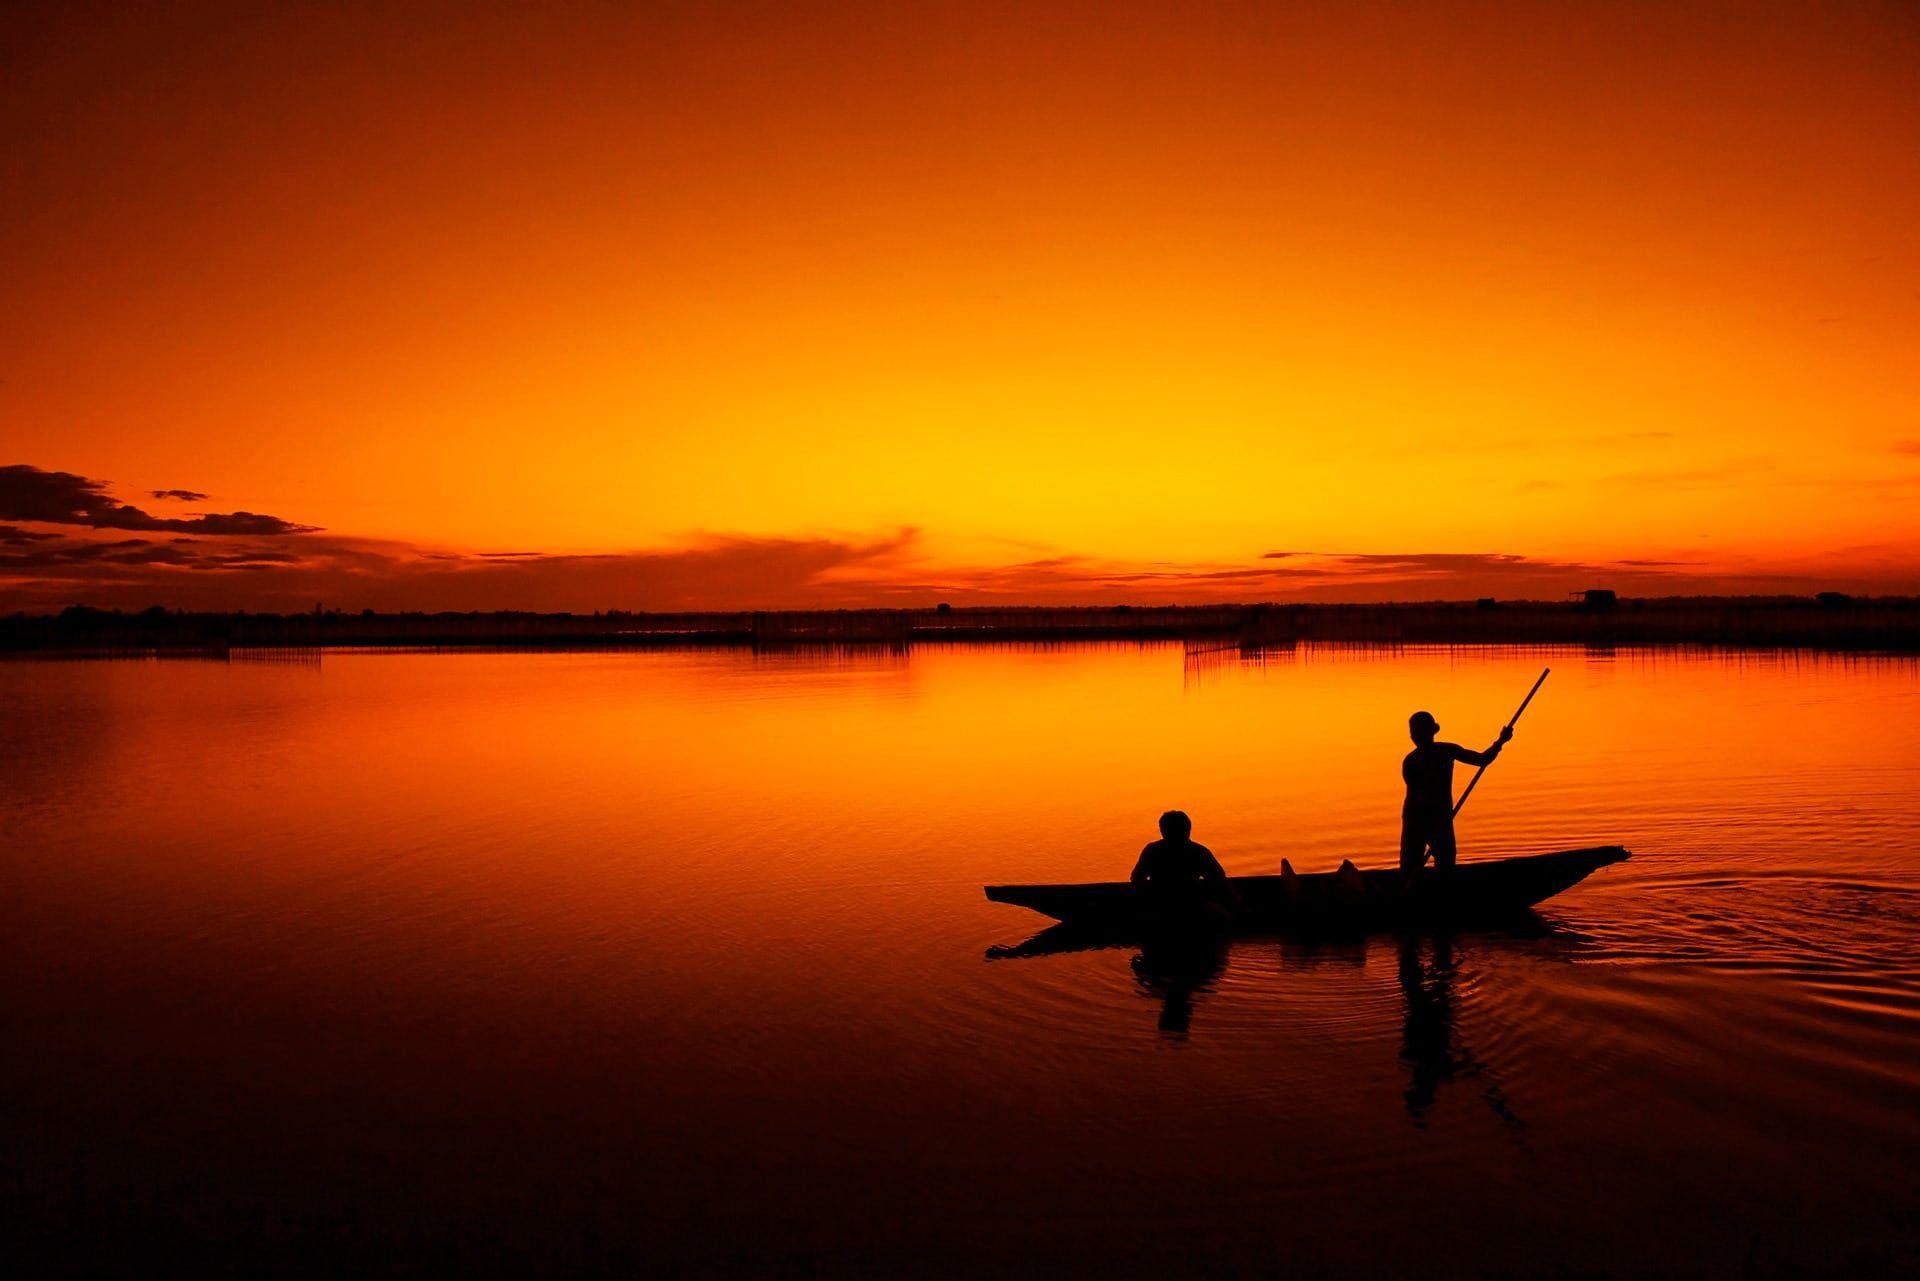 Silhouette Of Two Men On Canoe During Sunset Fishing Boat Fisherman Tam Giang Lagoon Hue Sunset Vietnam Binh Minh S Salt Water Fishing Fishing Trip Trip